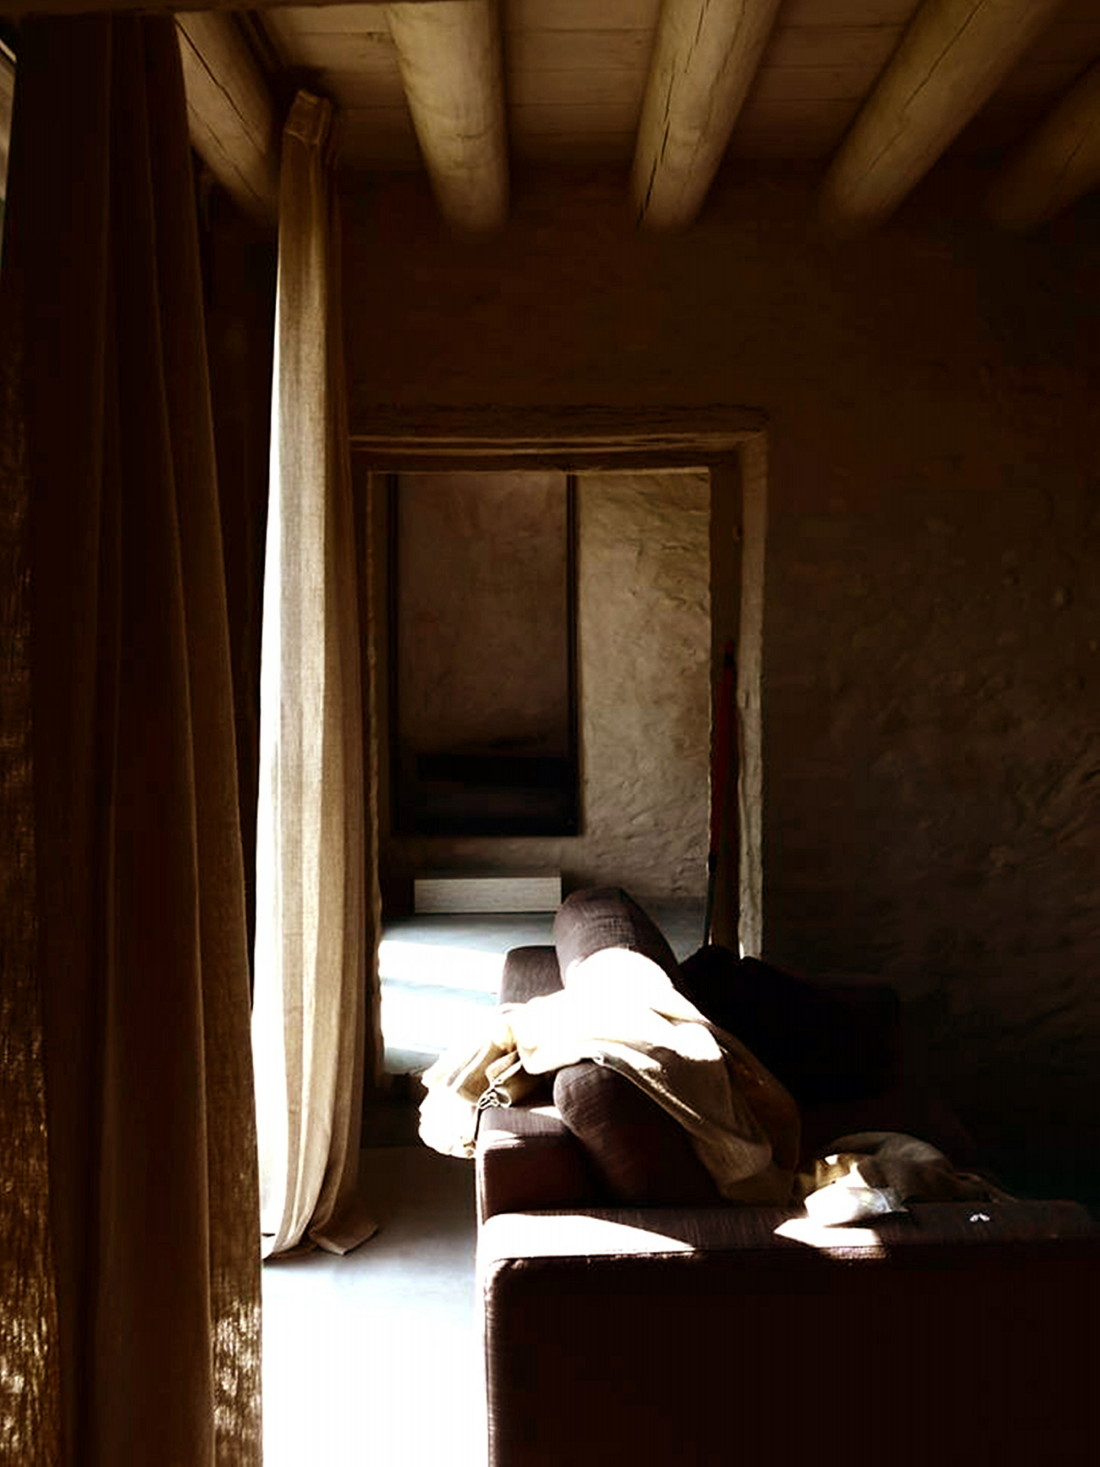 Реставрация виллы Brolo Saccomani в Италии от студии Bricolo Falsarella 14